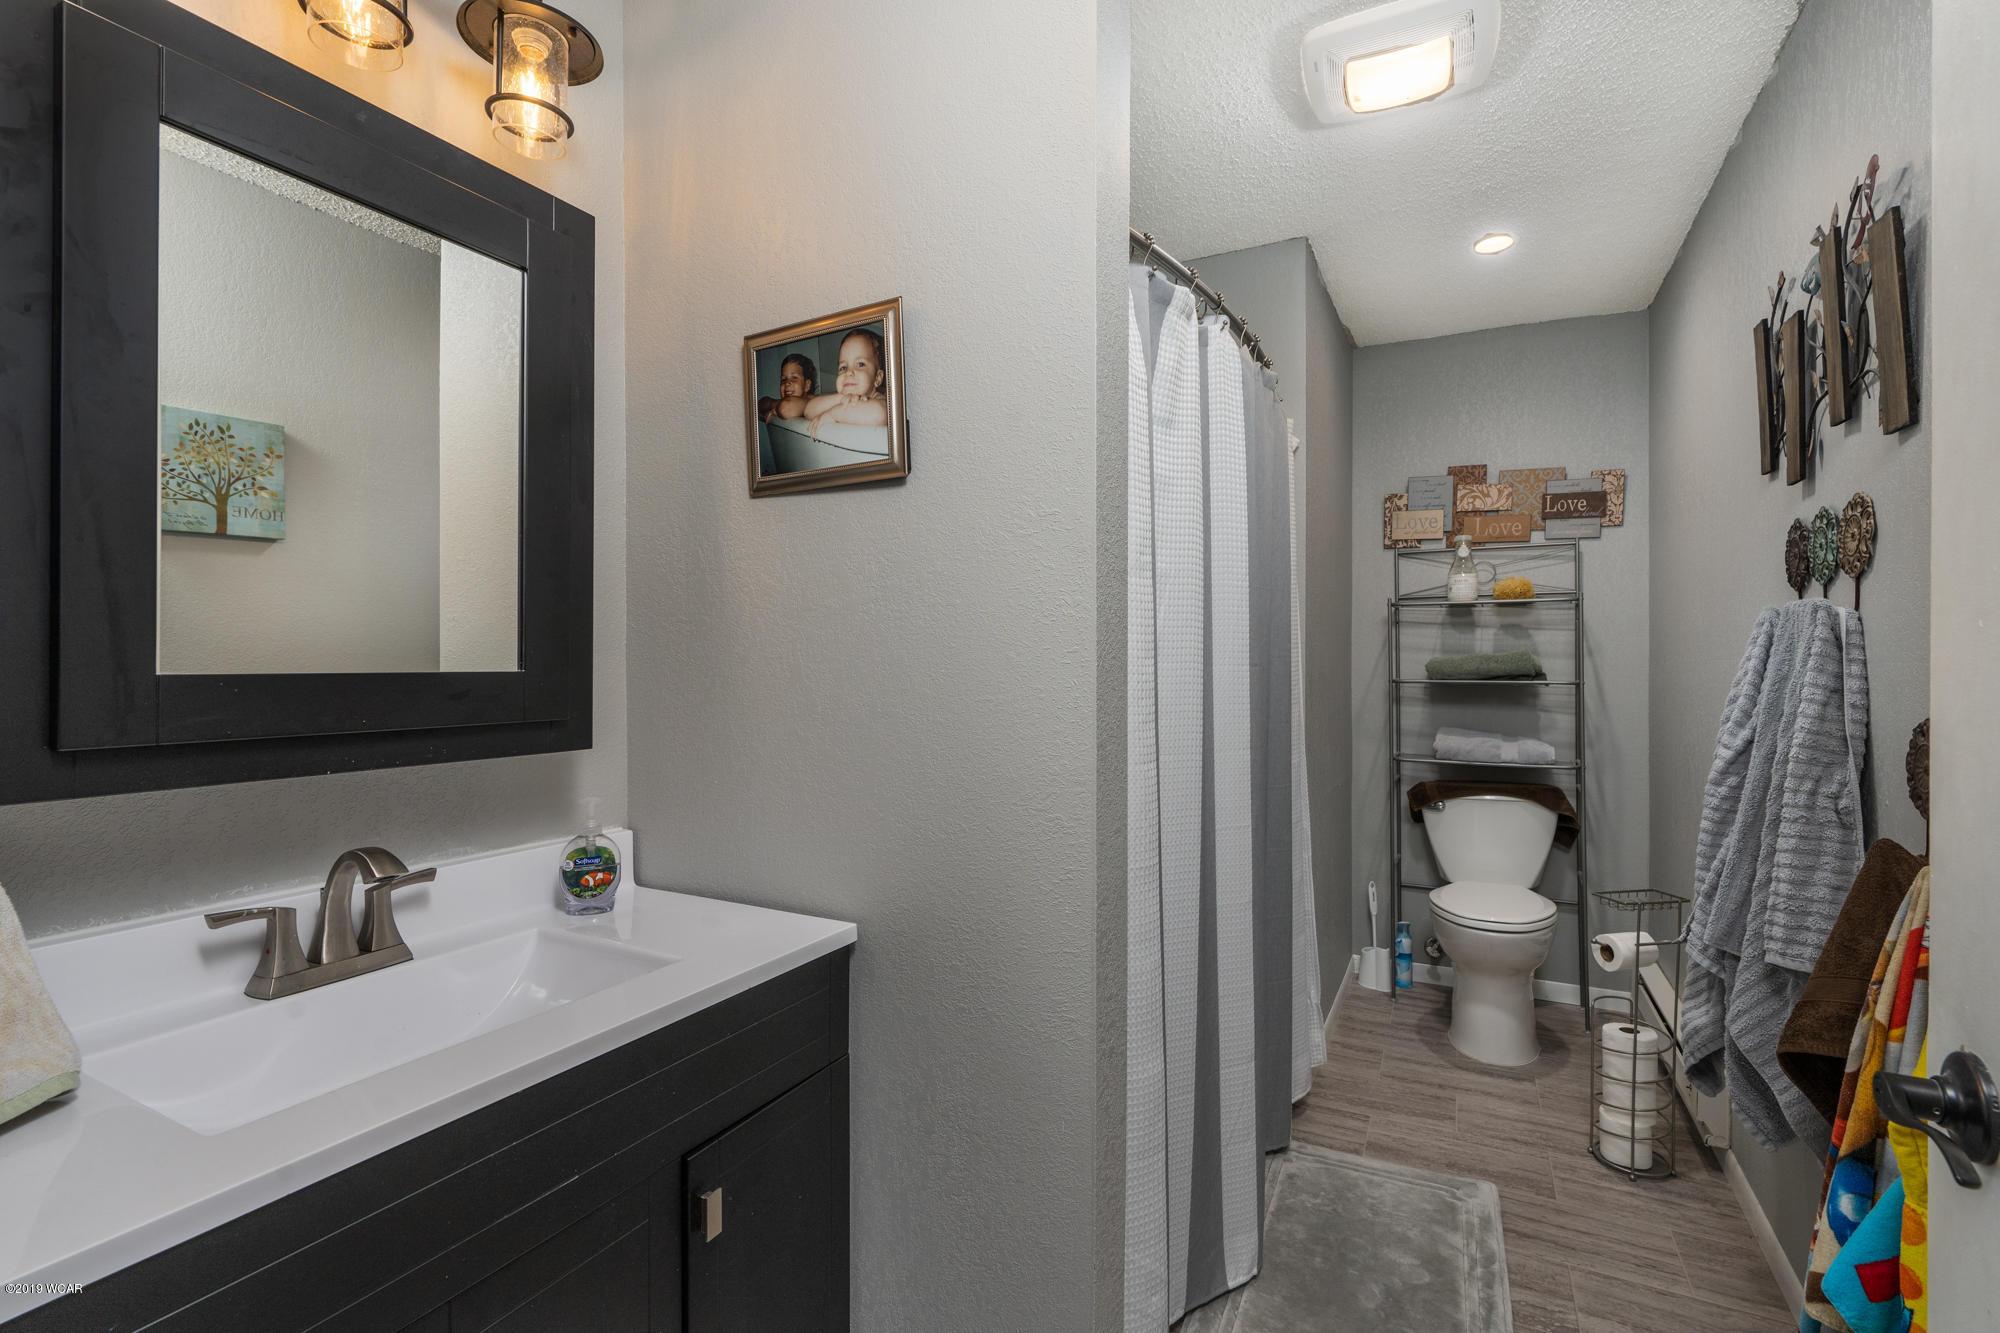 14445 NE Hwy 23,Spicer,3 Bedrooms Bedrooms,2 BathroomsBathrooms,Single Family,NE Hwy 23,6033554